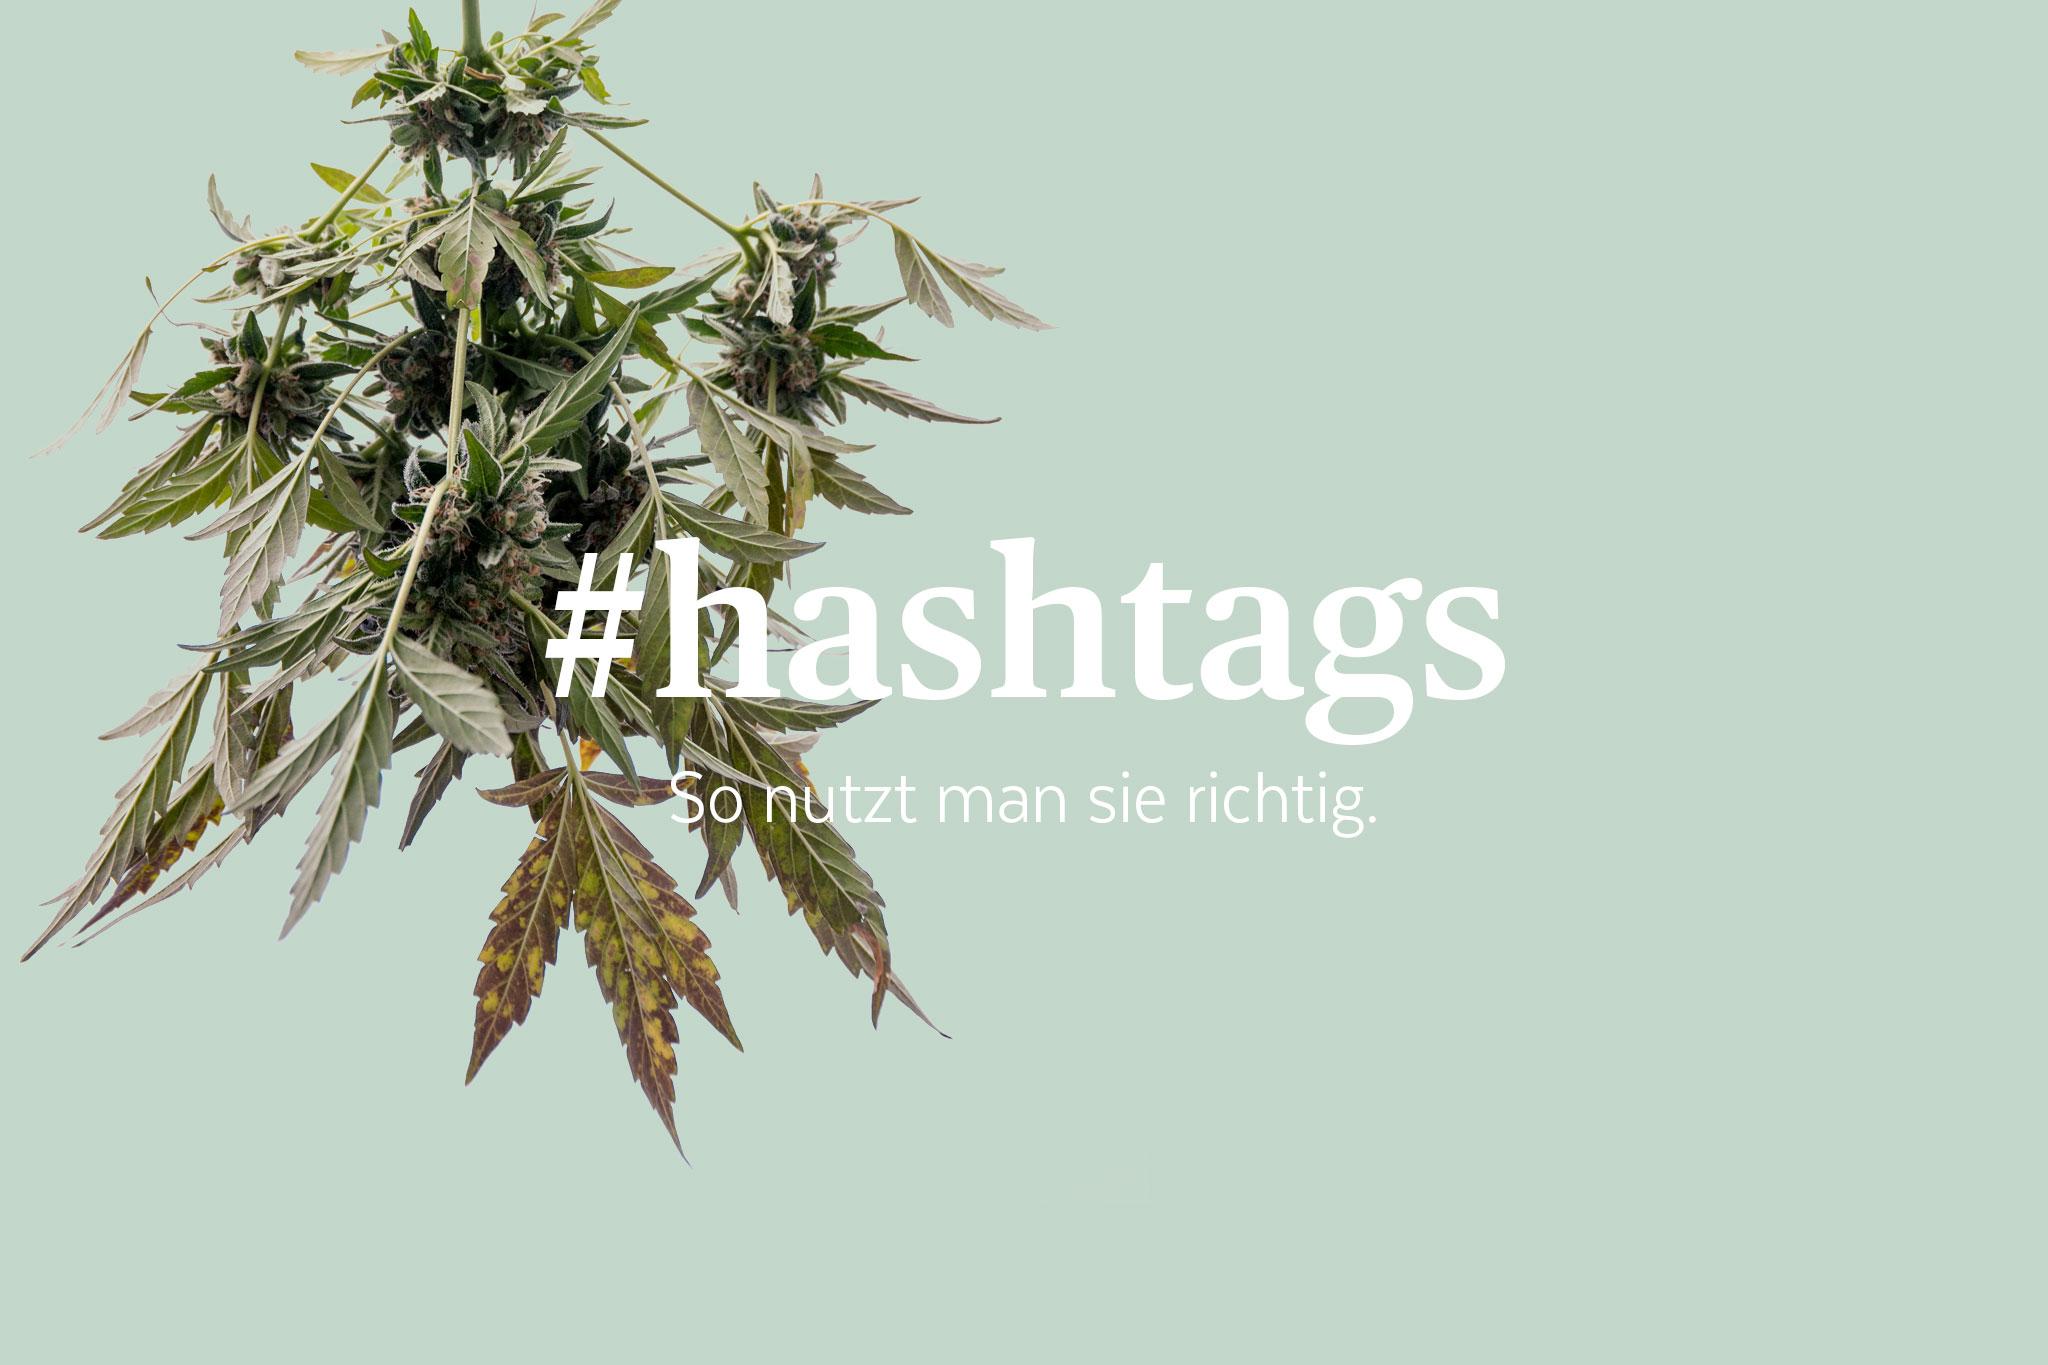 socialmedia #hashtags